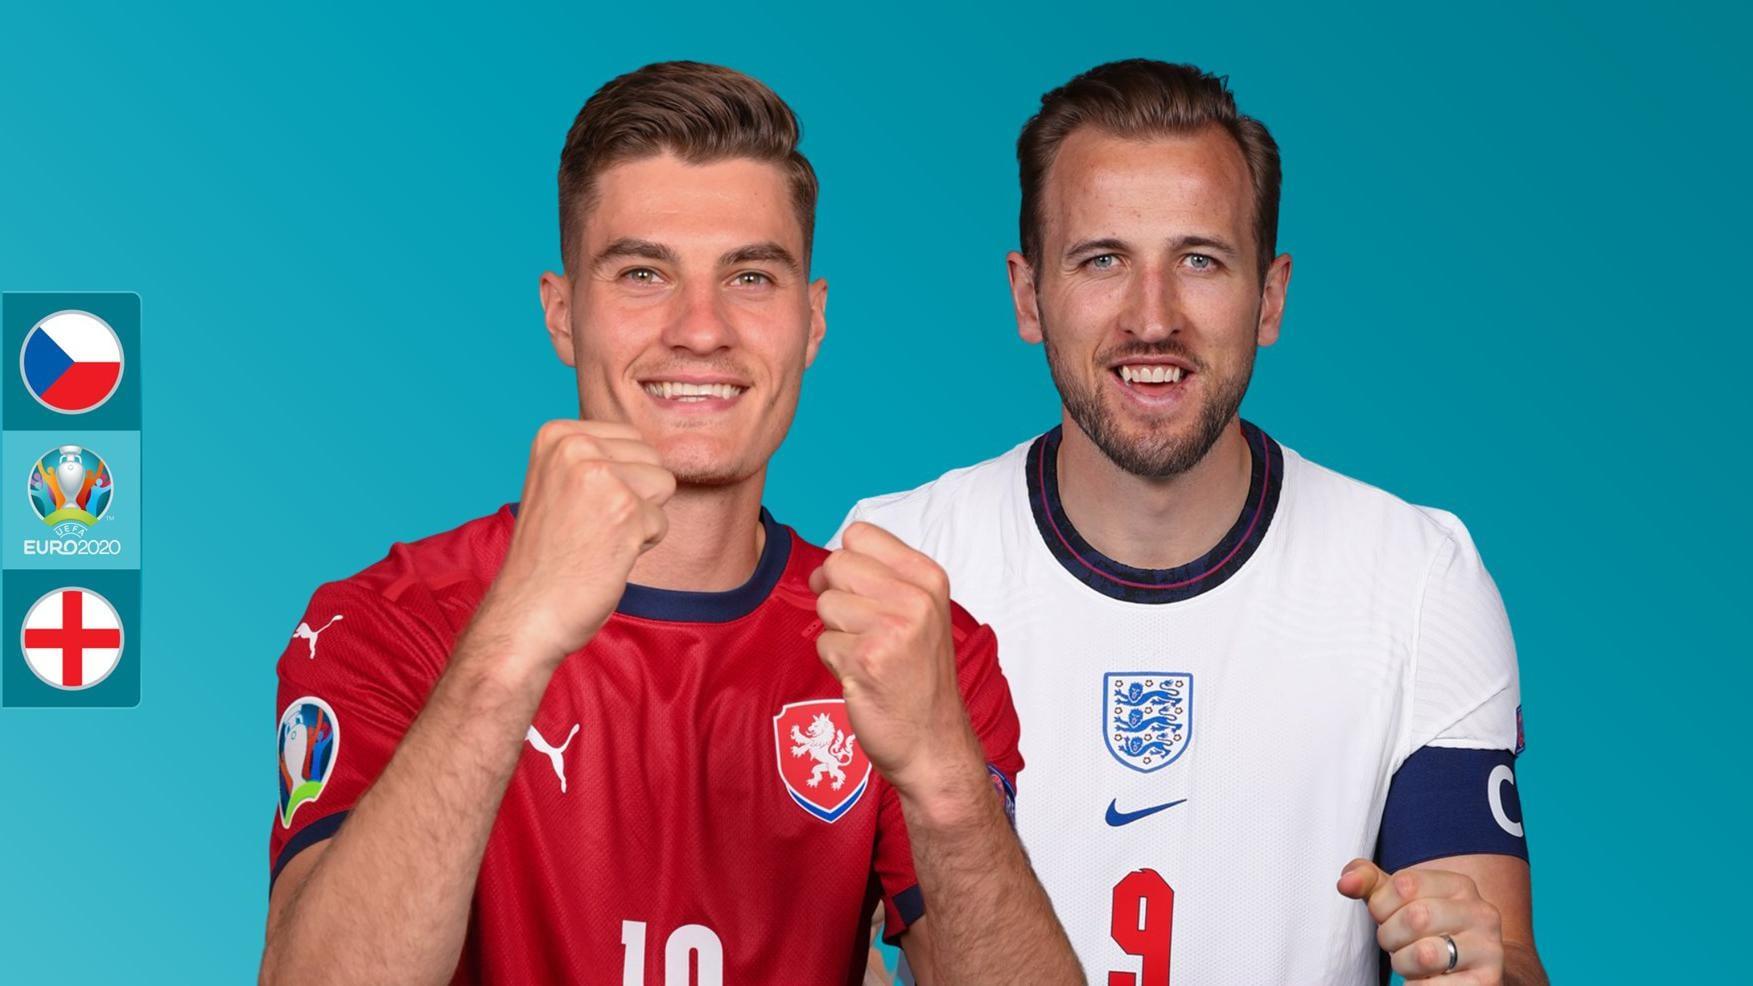 Czech Republic vs England preview